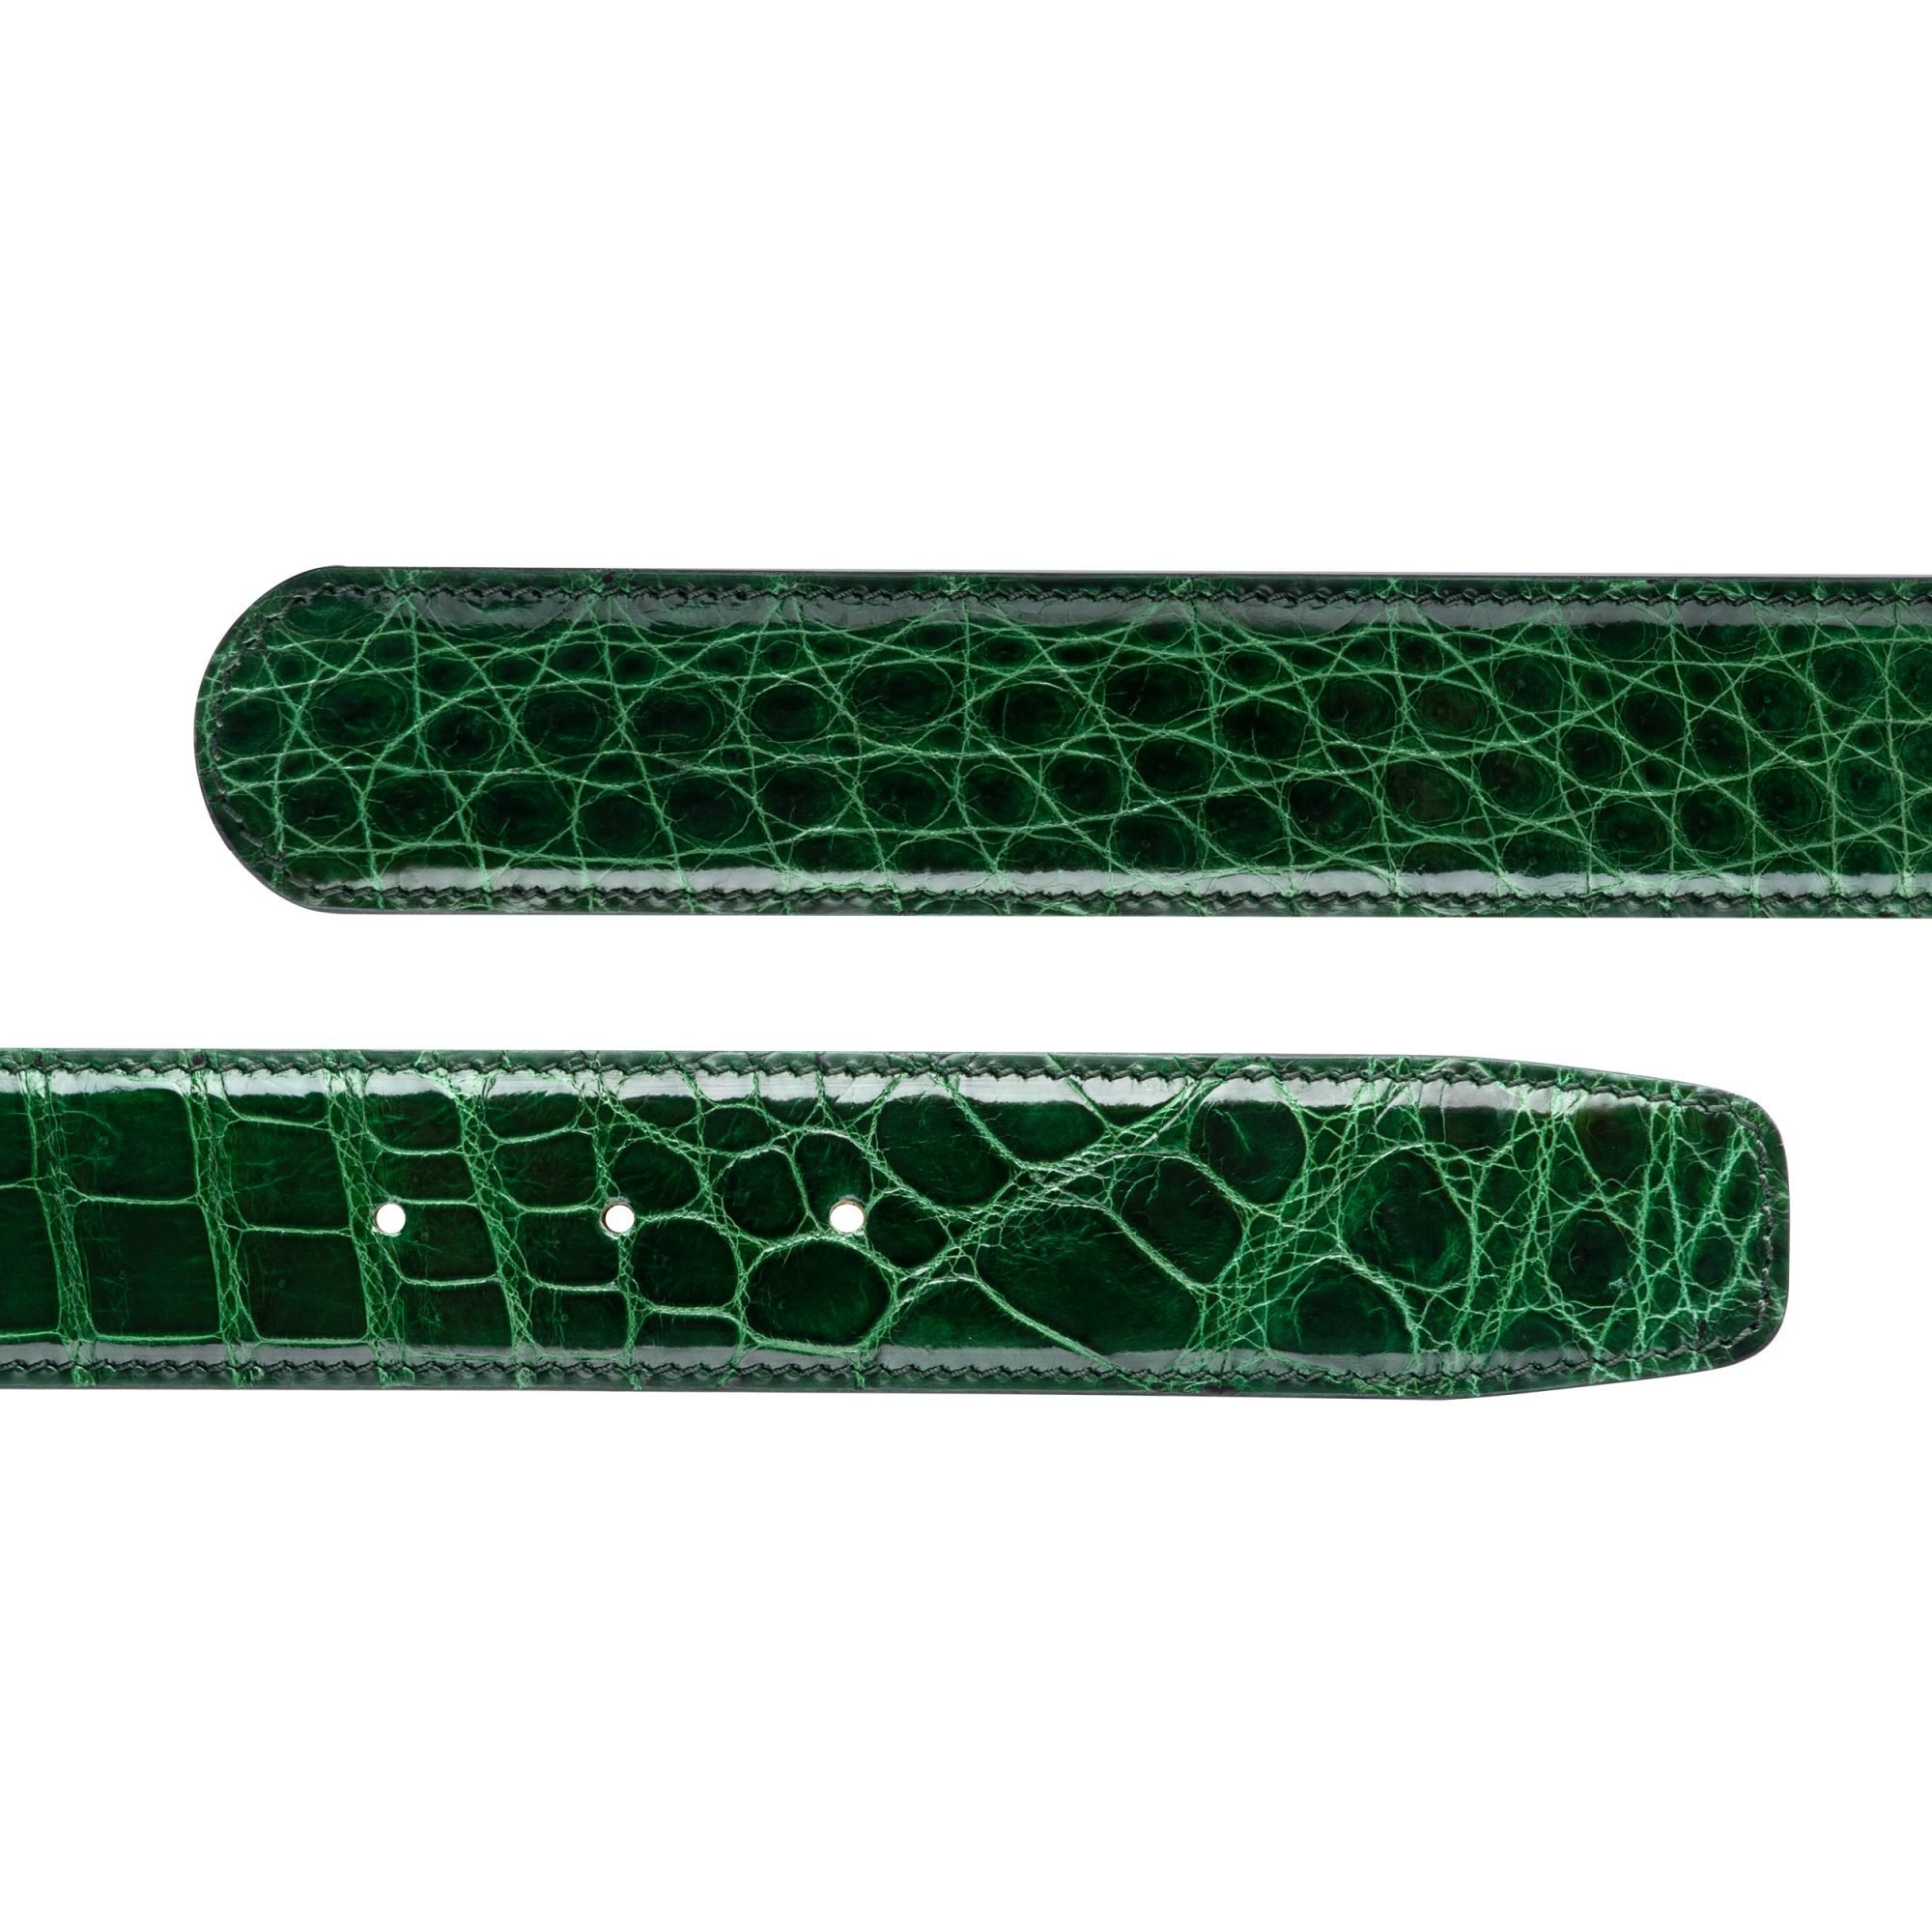 38MM VIKTOR ALEXANDER CROCODILE ALLIGATOR HIGH SHINE GLOSSY EMERALD DARK GREEN COLOUR BELT DUAL PROFILE